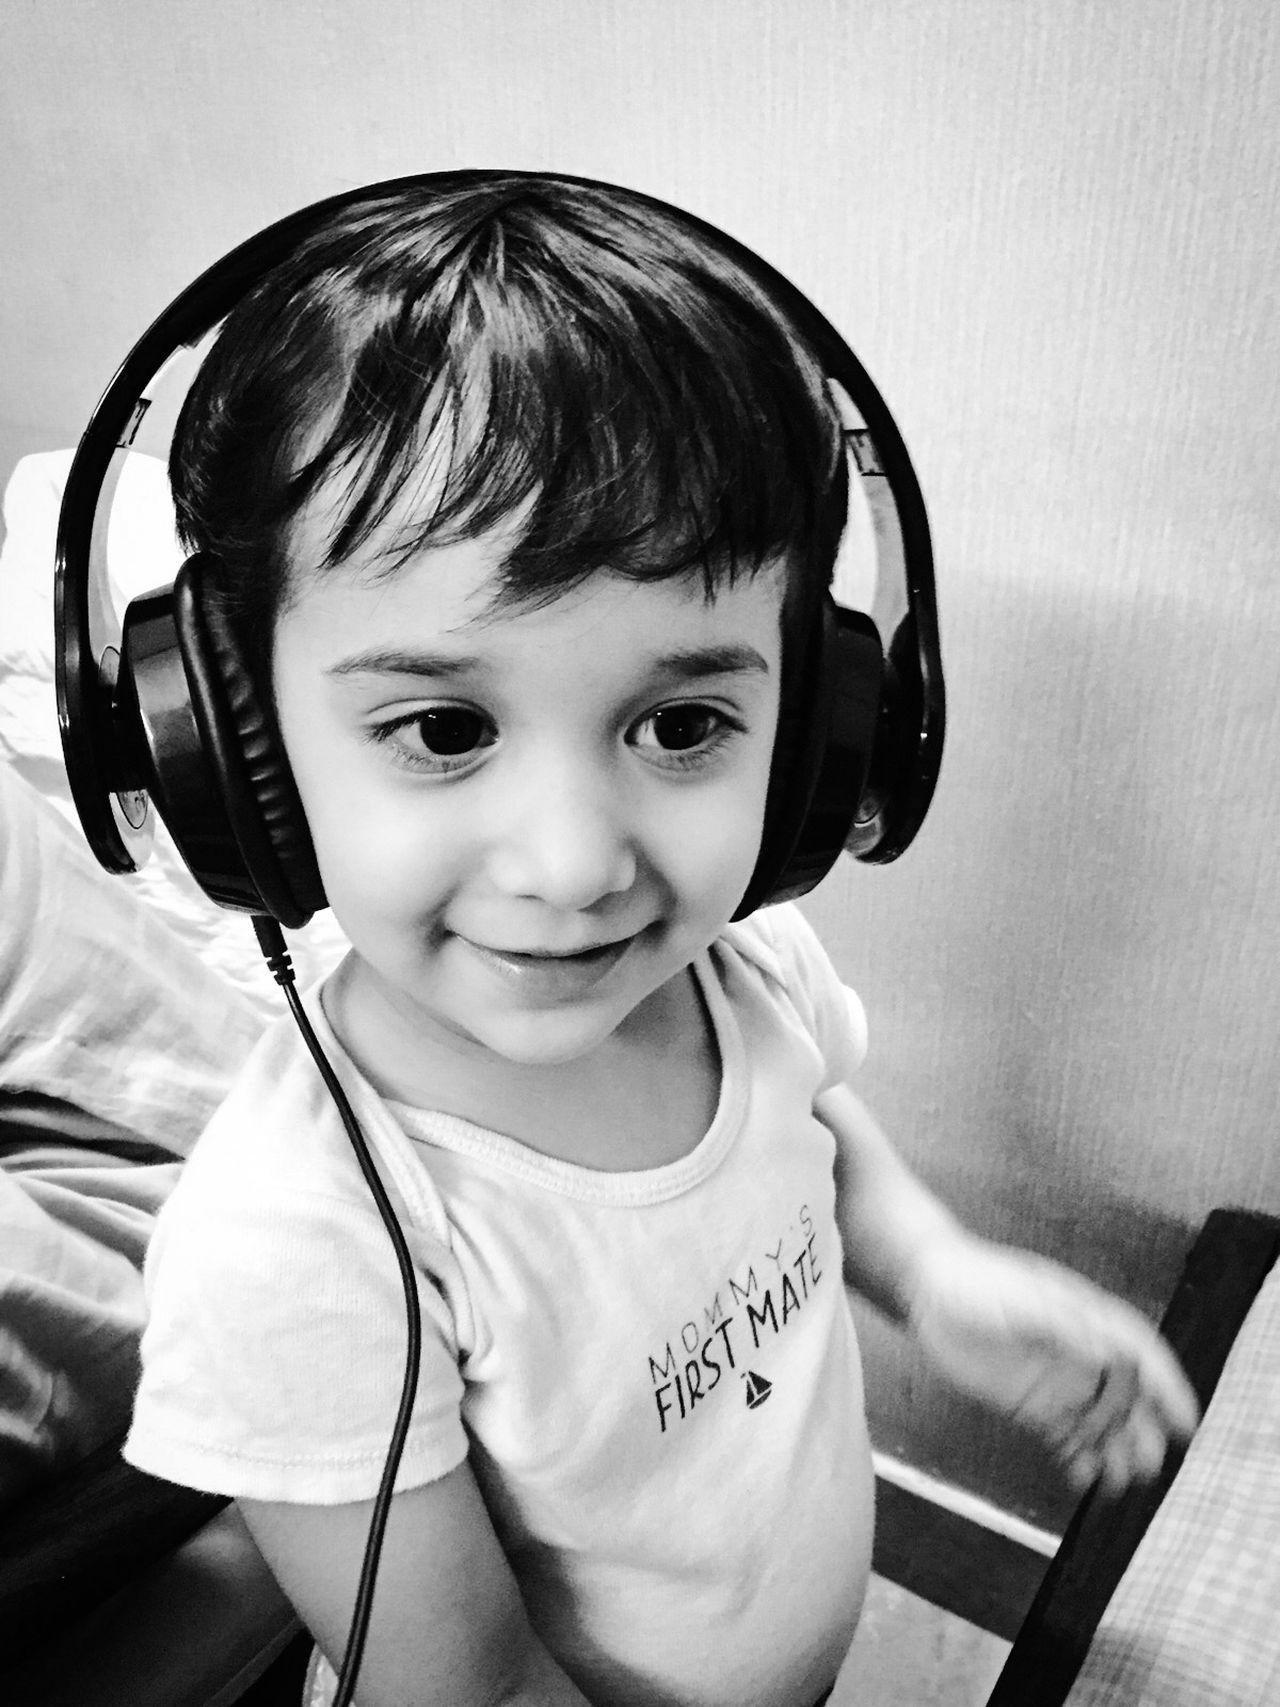 Youth Of Today Musiclover Dj Headphones On❤ Moderndaykids Generation Technology EyeEm EyeEm Gallery EyeEm Best Shots